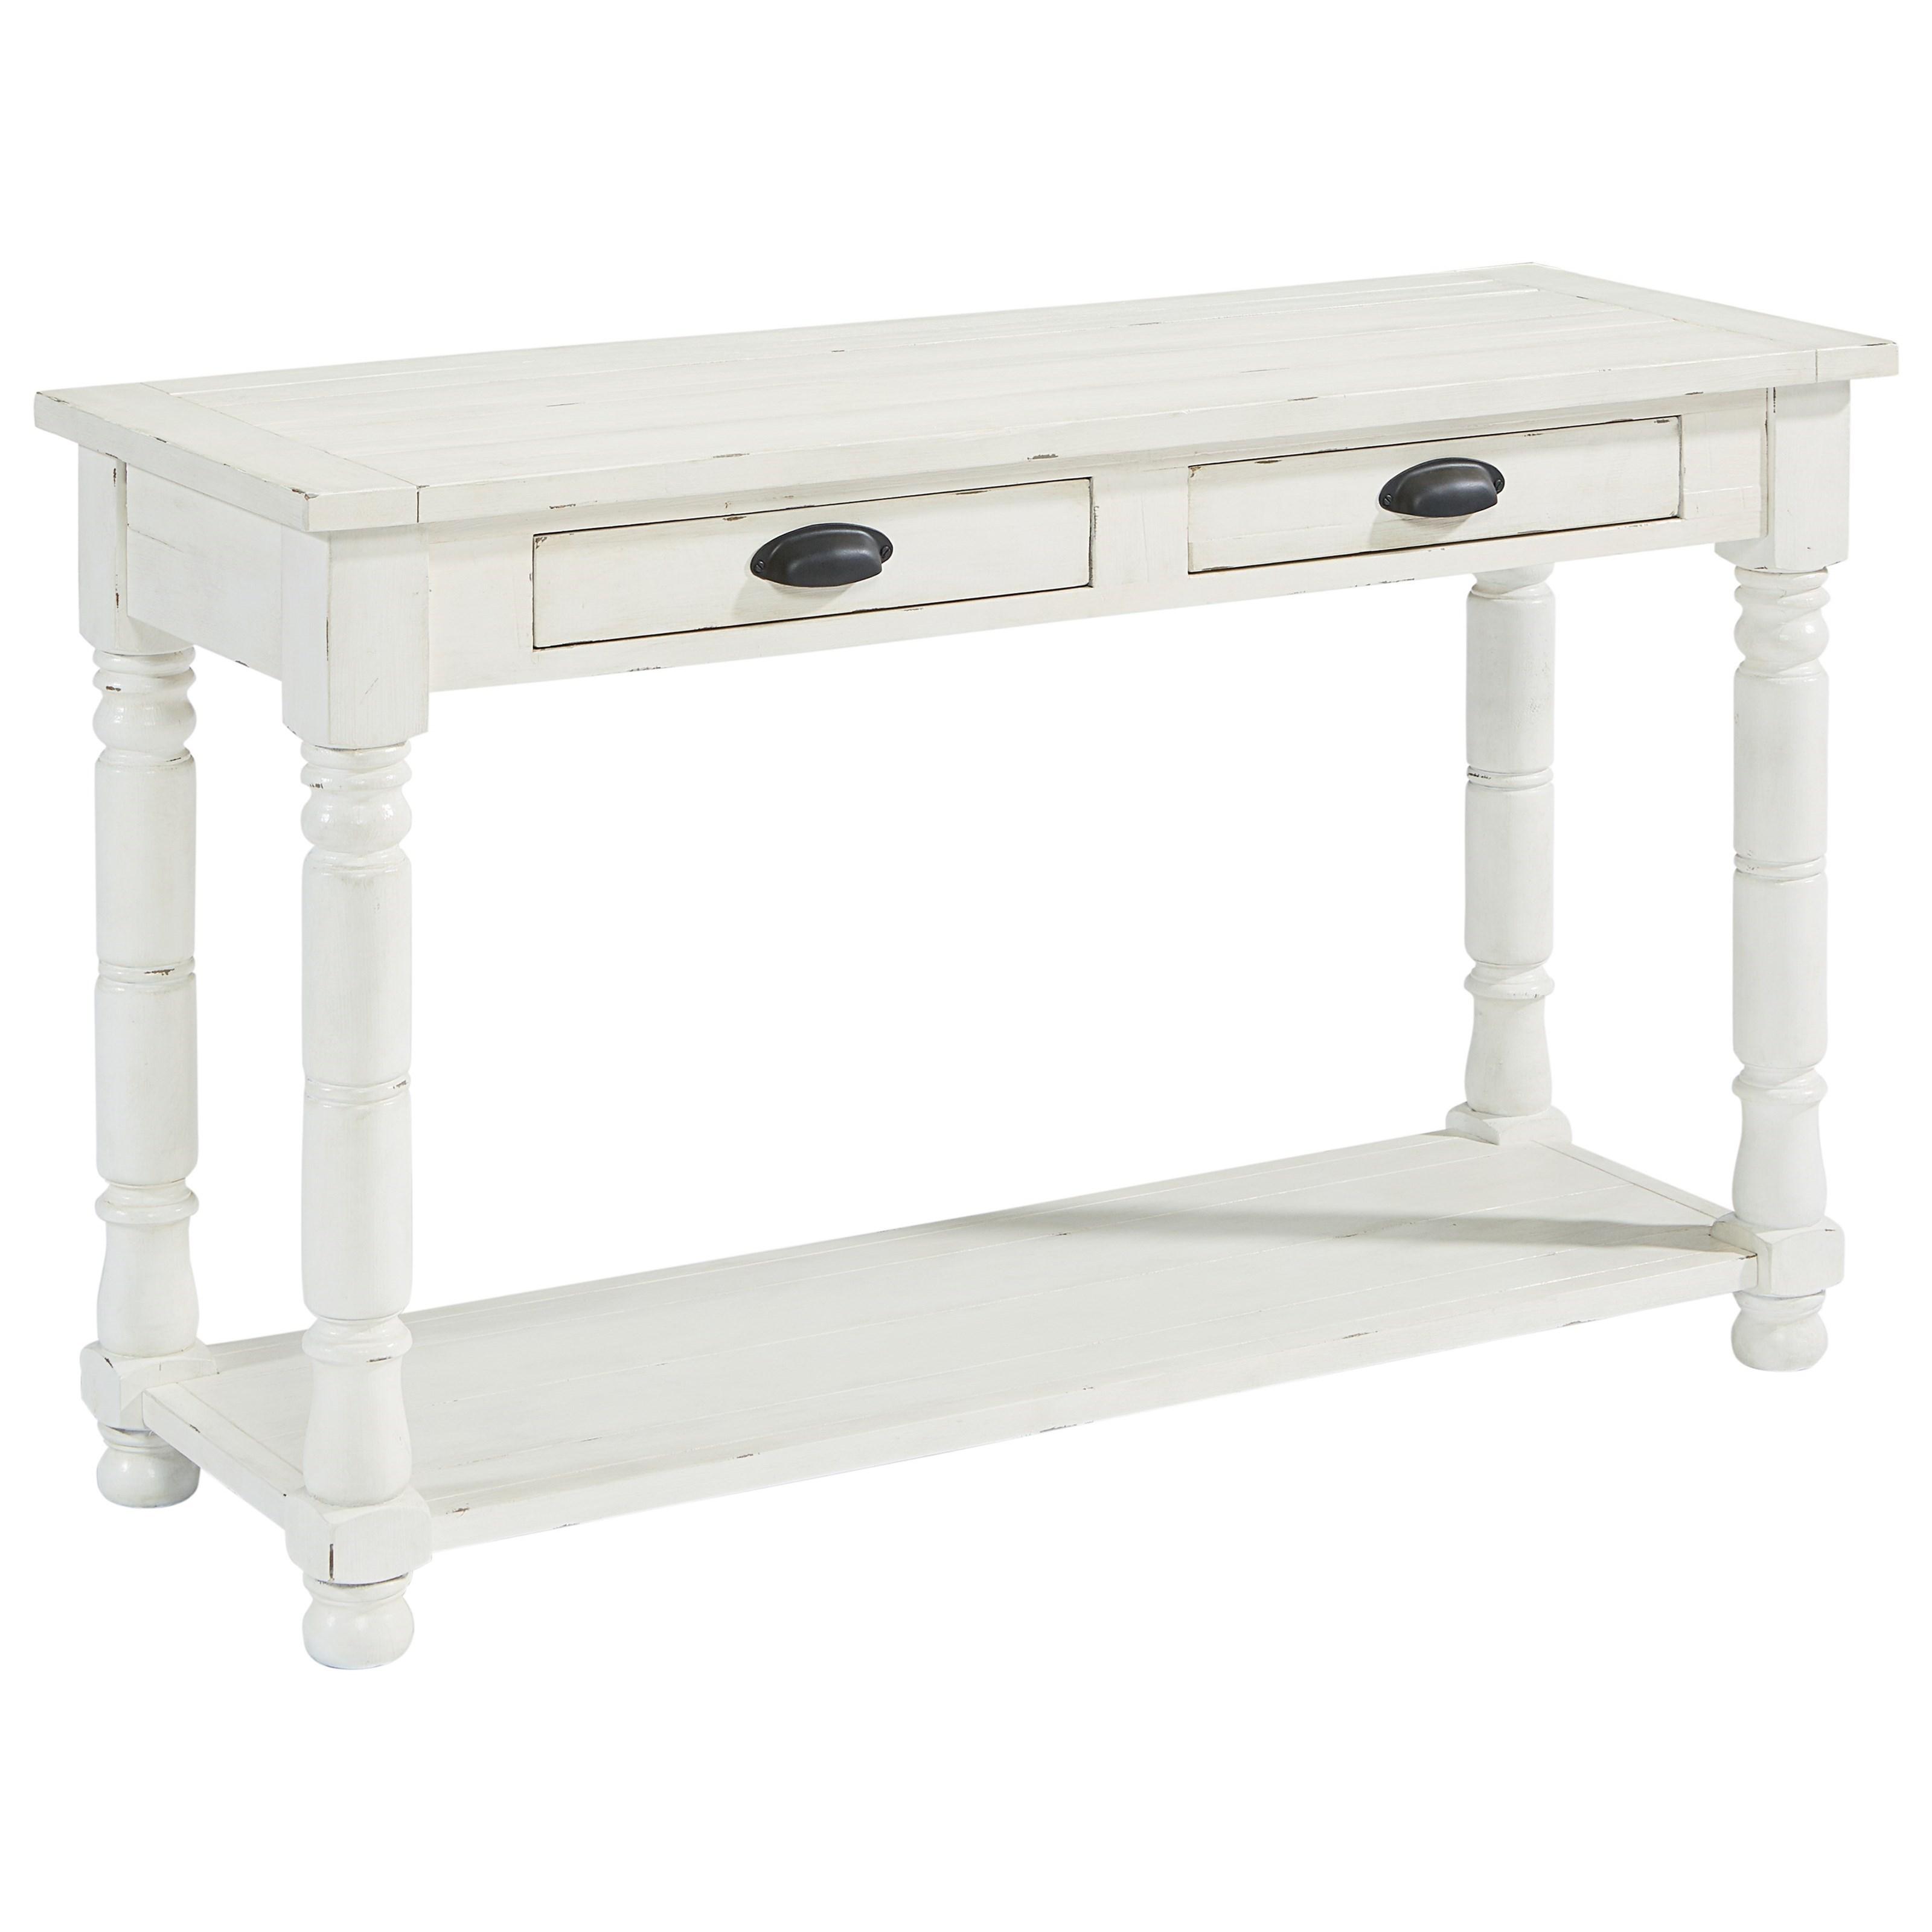 Magnolia Home By Joanna Gaines PrimitiveBobbin Console Table